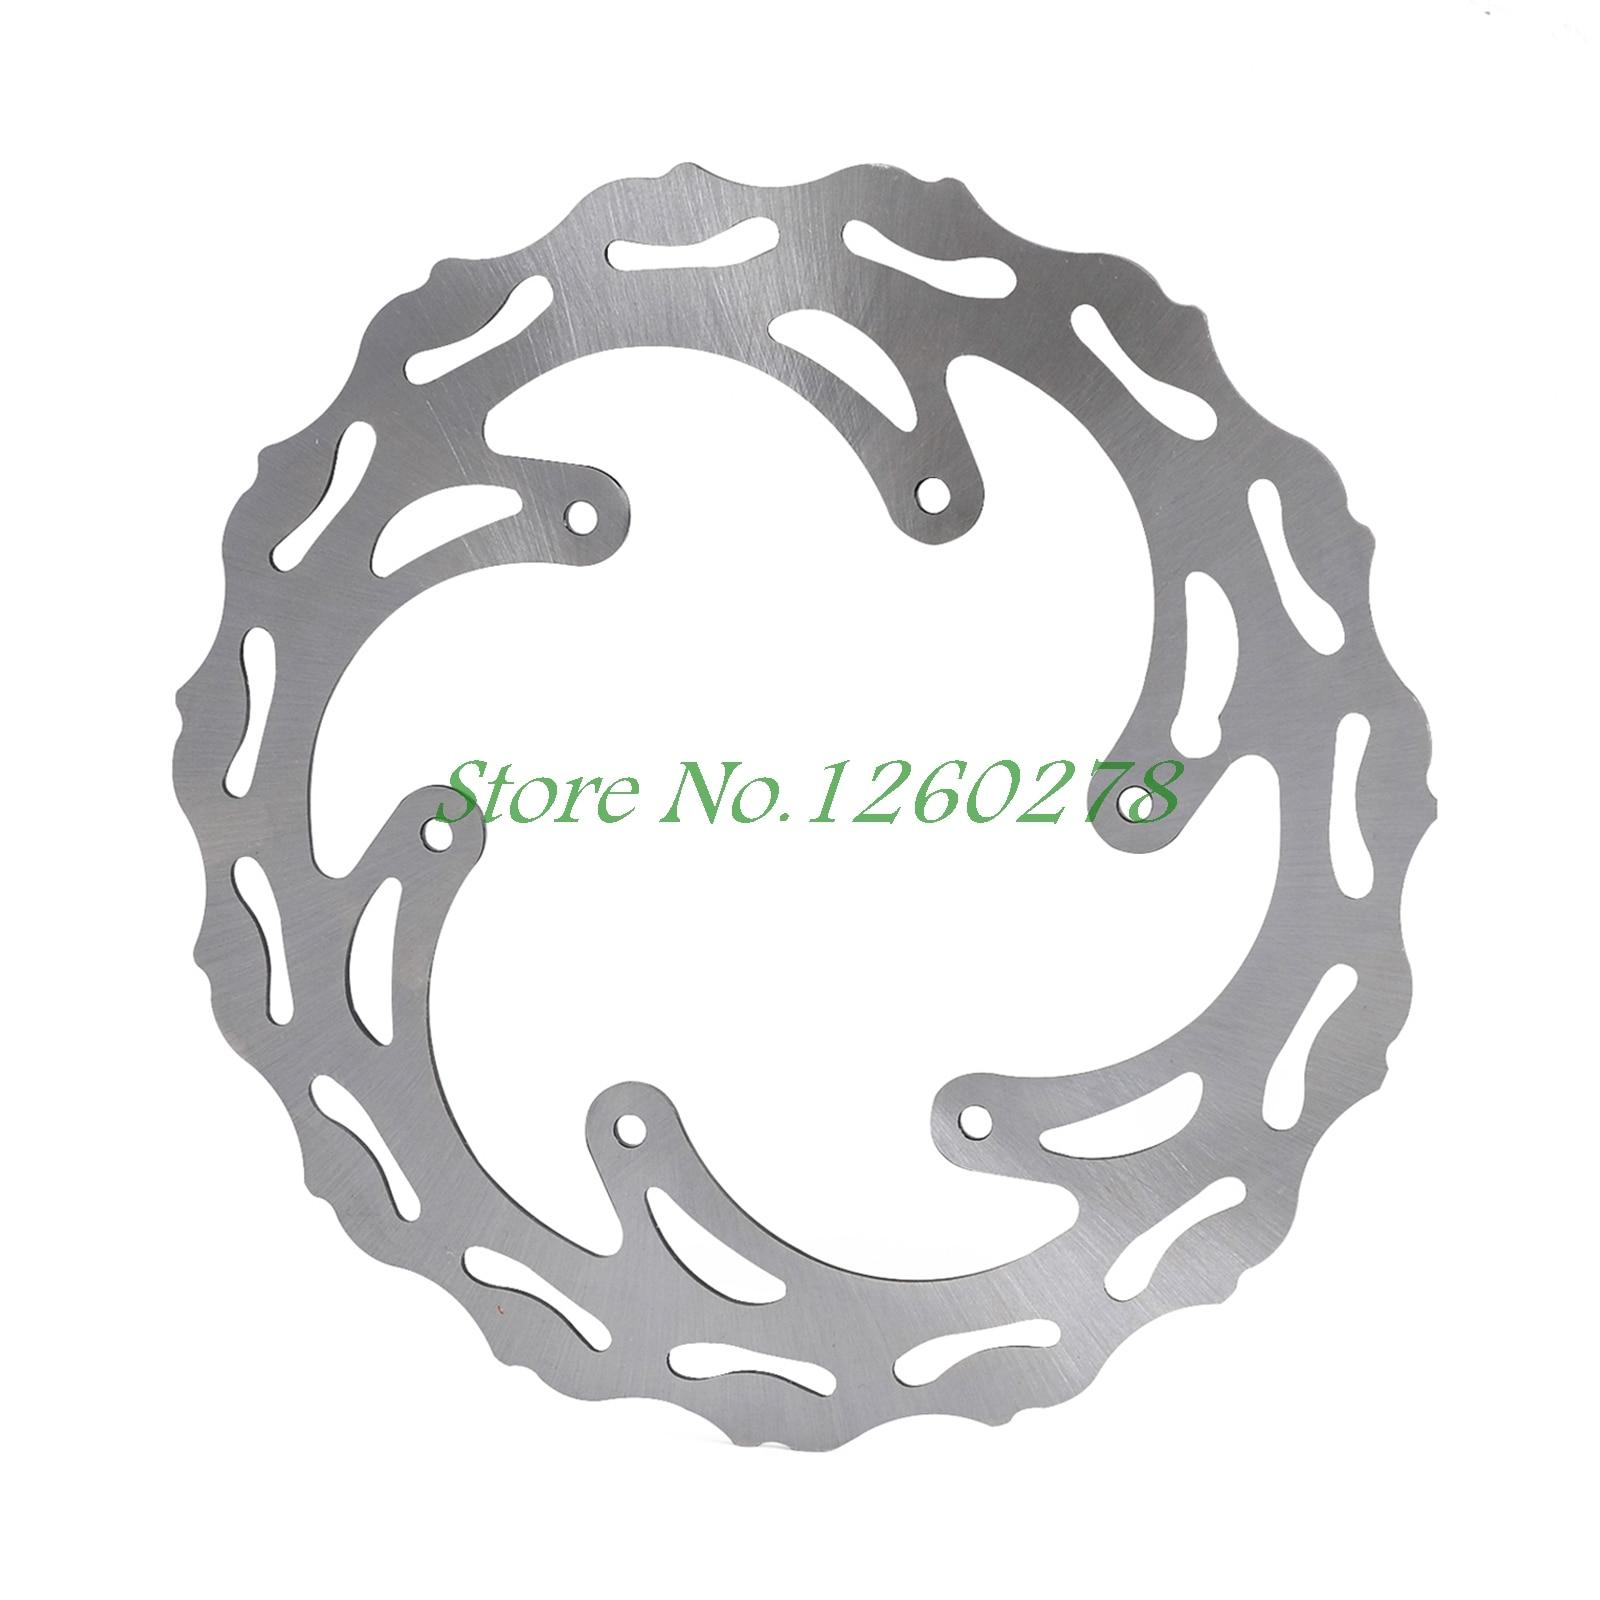 Front Wavy Brake Disc Rotor For Husaberg FE TE FX 250 300 350 450 501 Husqvarna FC TC FE TE 125 250 300 350 501 2014 2015<br>